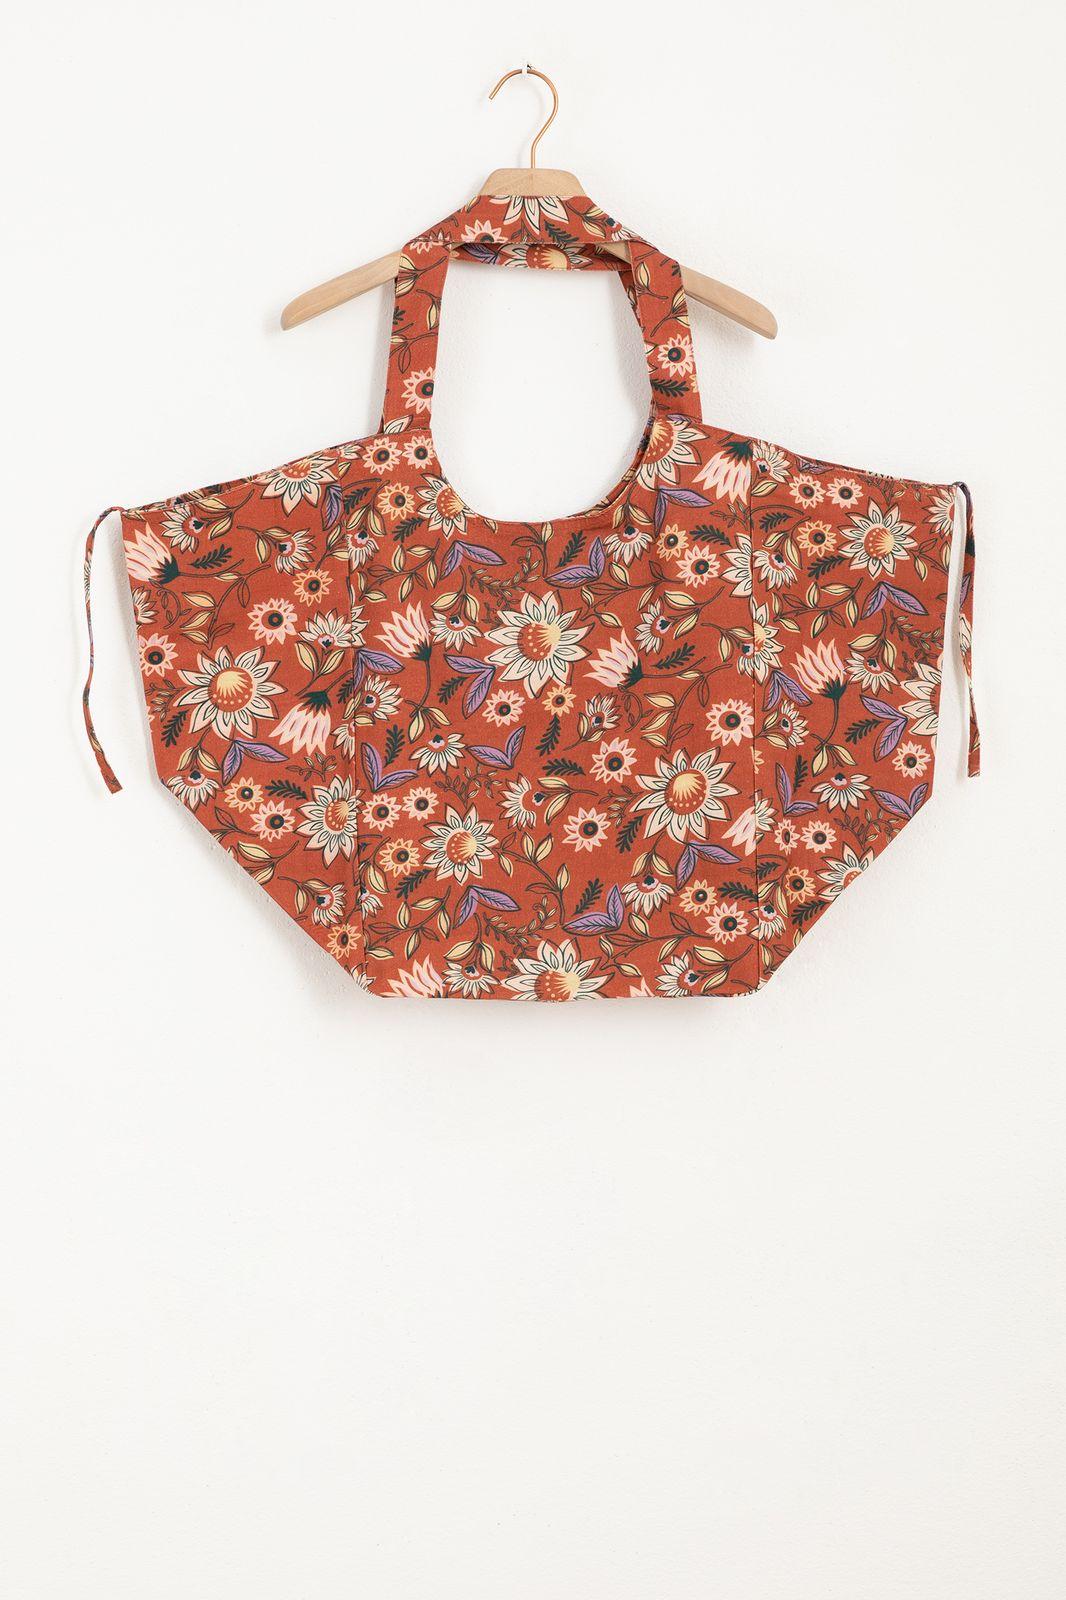 Rode shopper met all over bloemenprint - Dames | Sissy-Boy